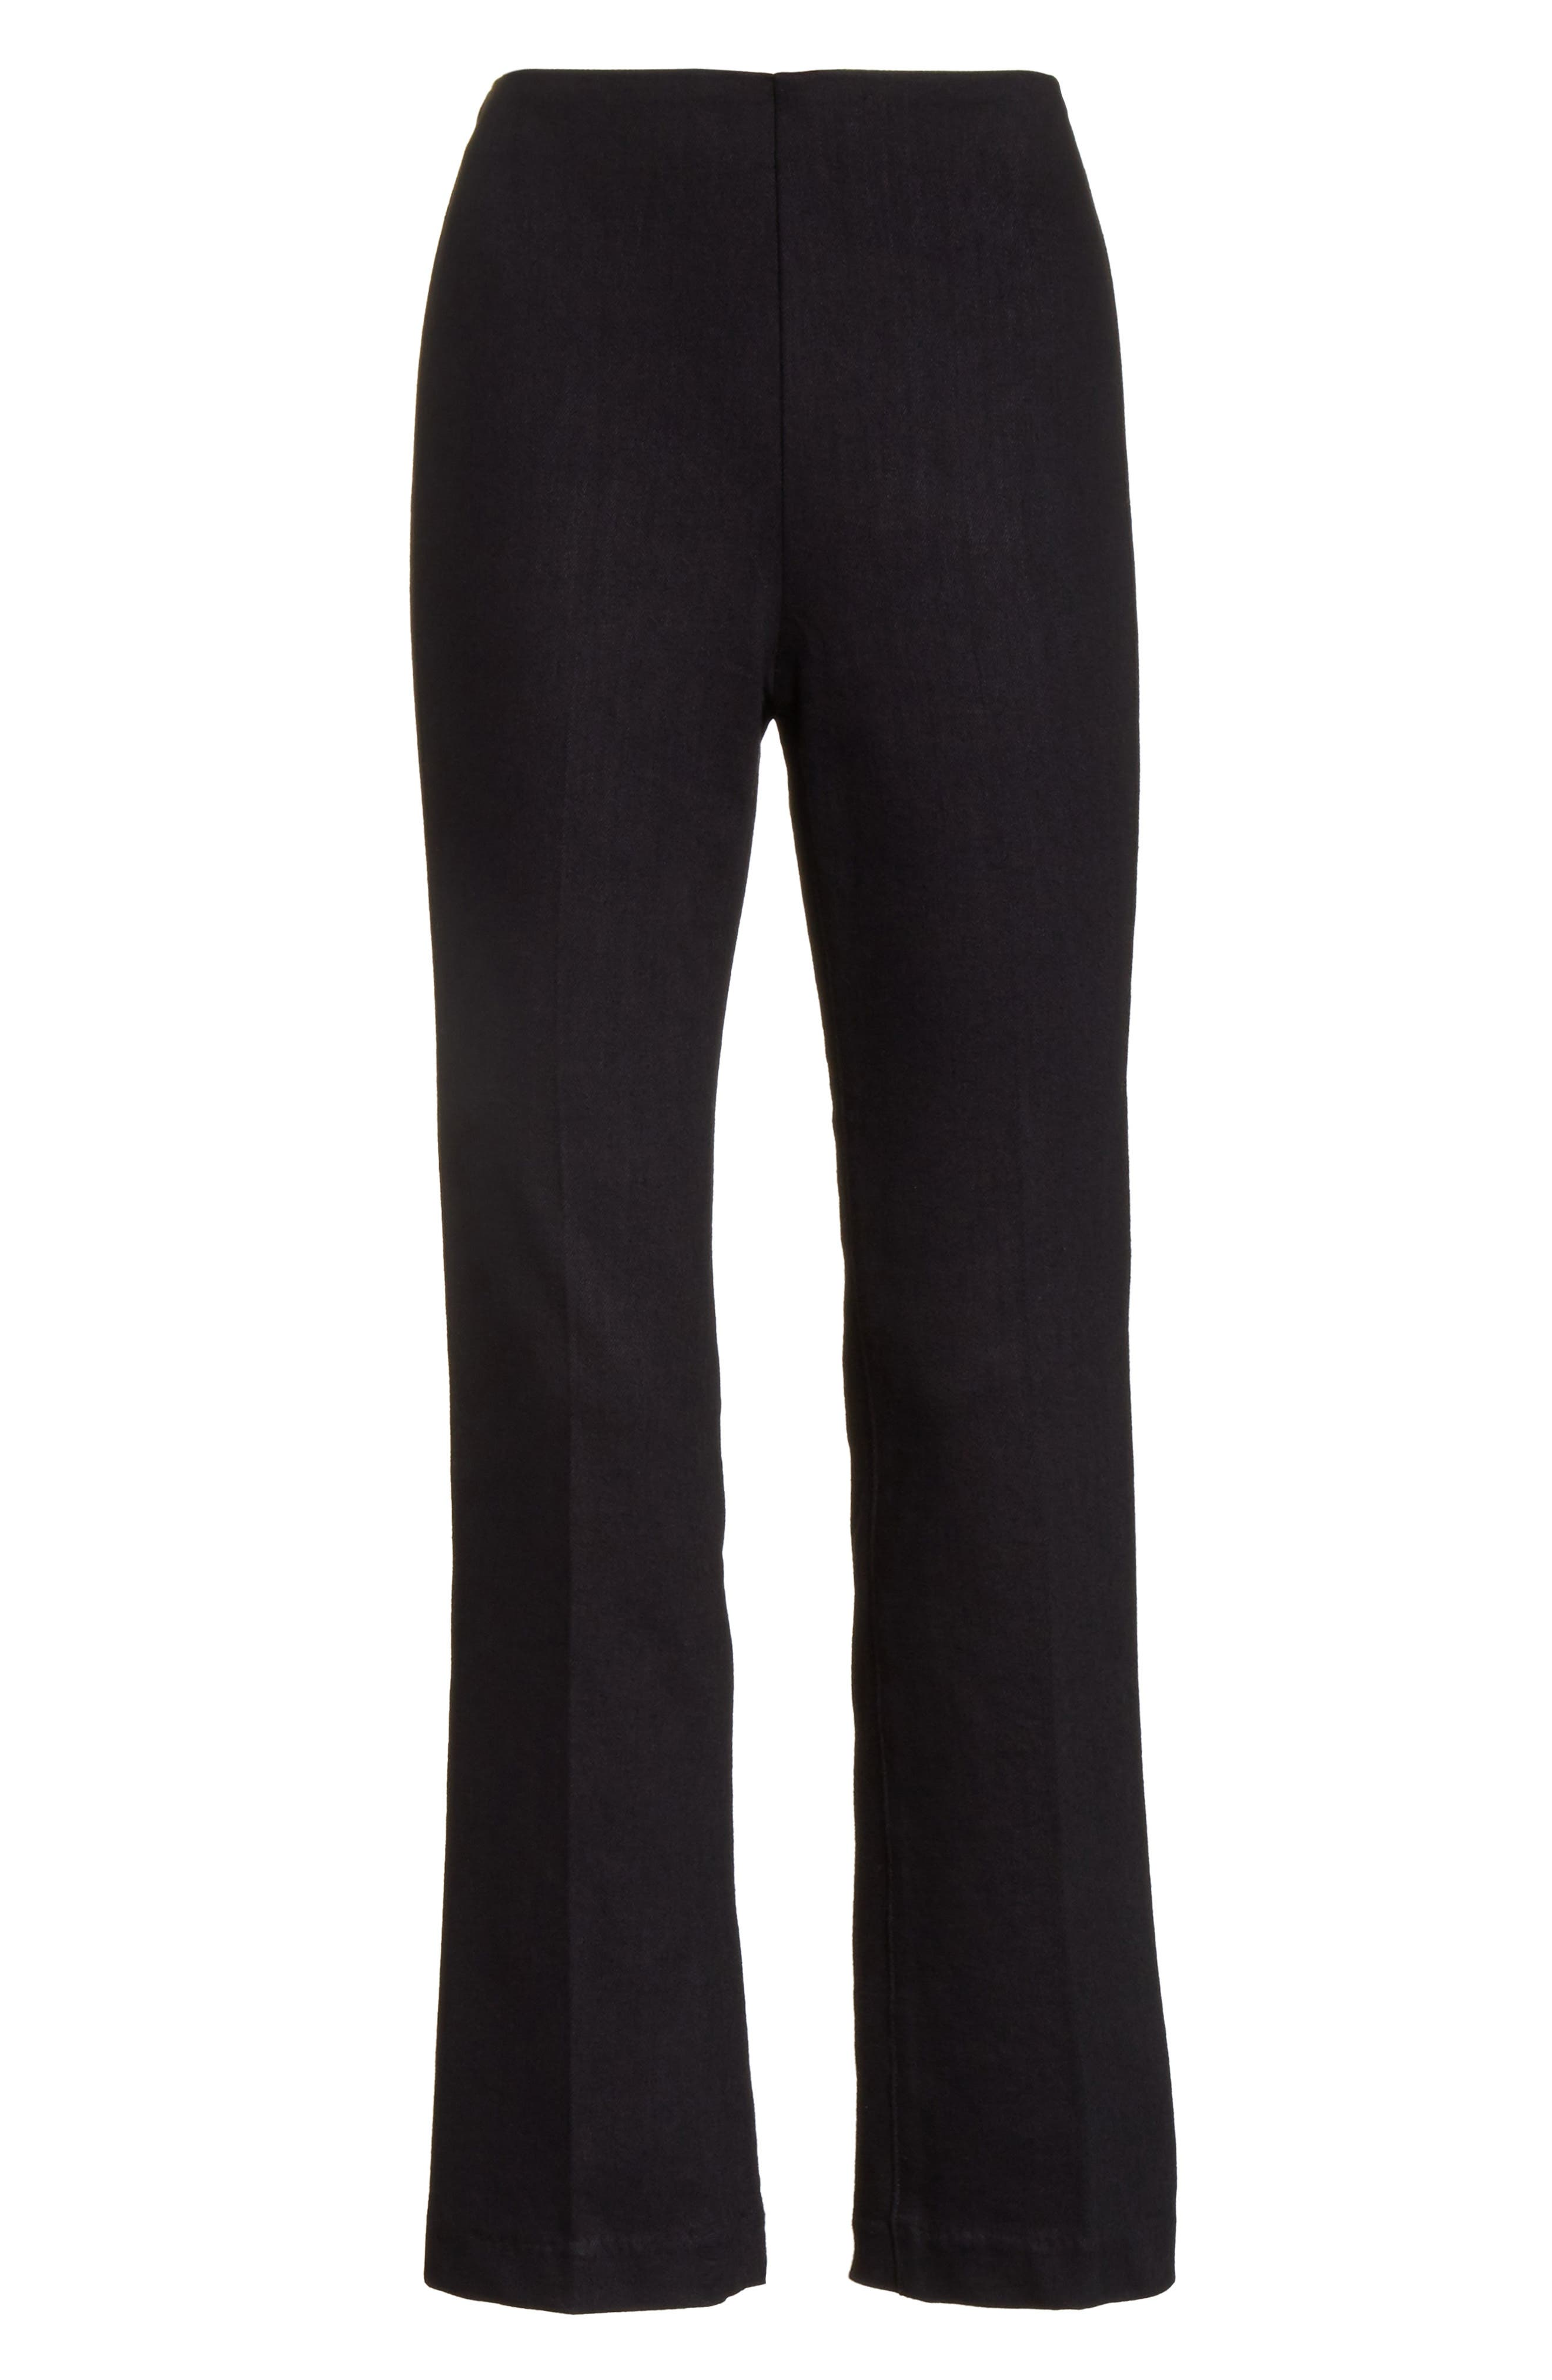 Hina High Rise Crop Pants,                             Alternate thumbnail 6, color,                             Black